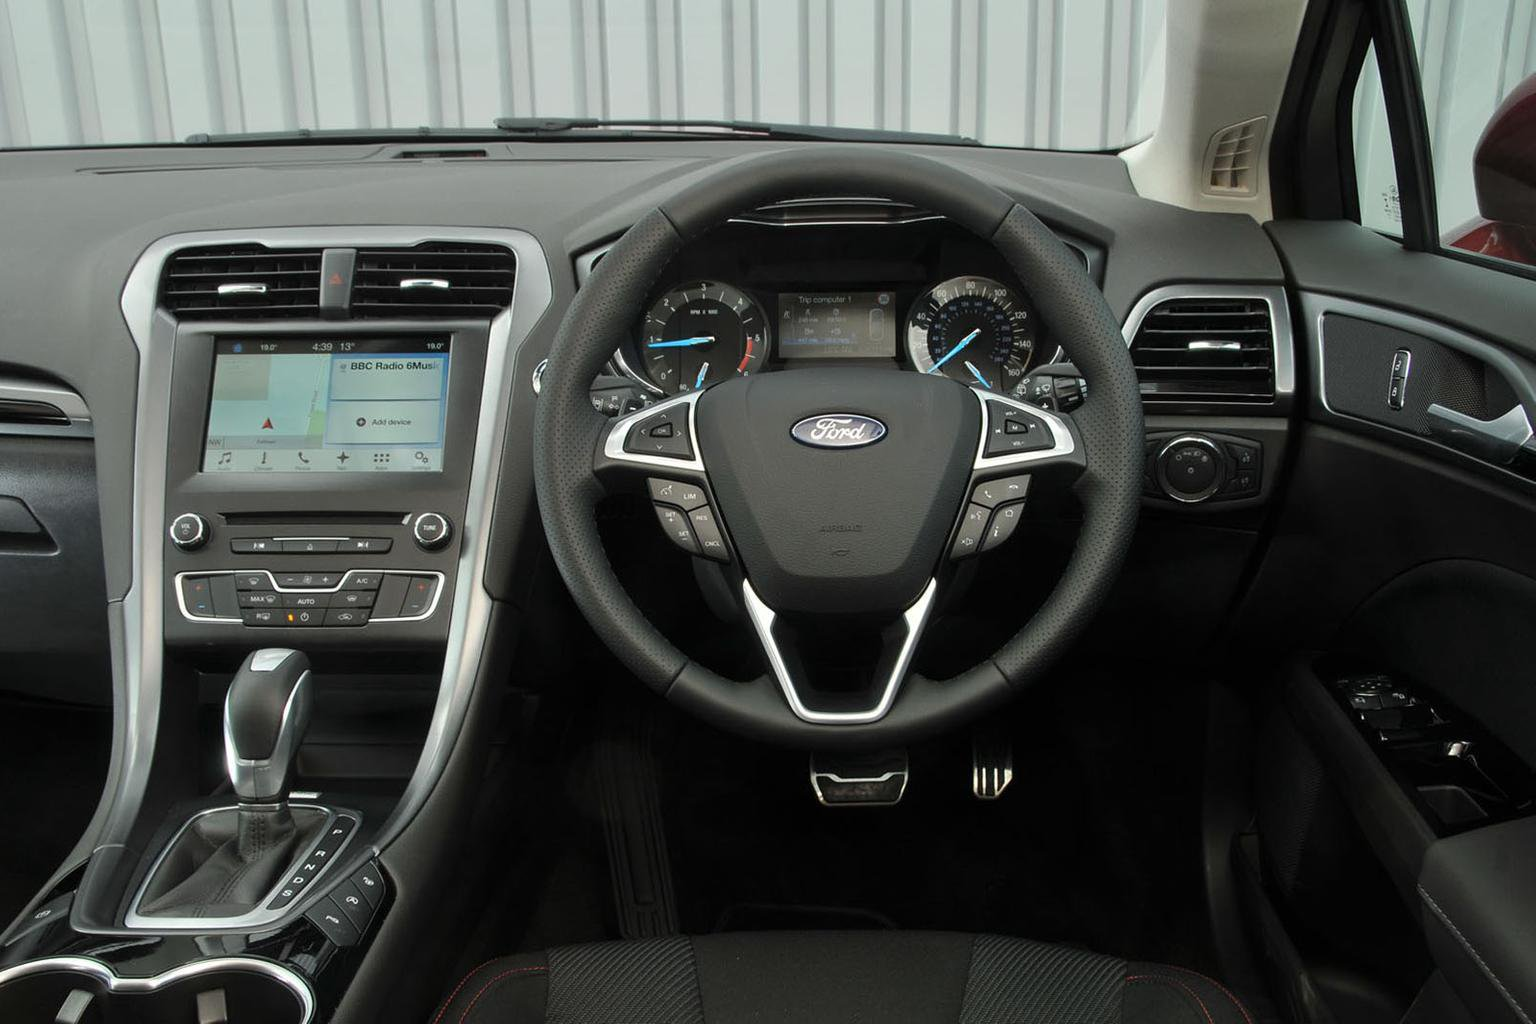 Ford Mondeo Interior, Sat Nav, Dashboard | What Car?